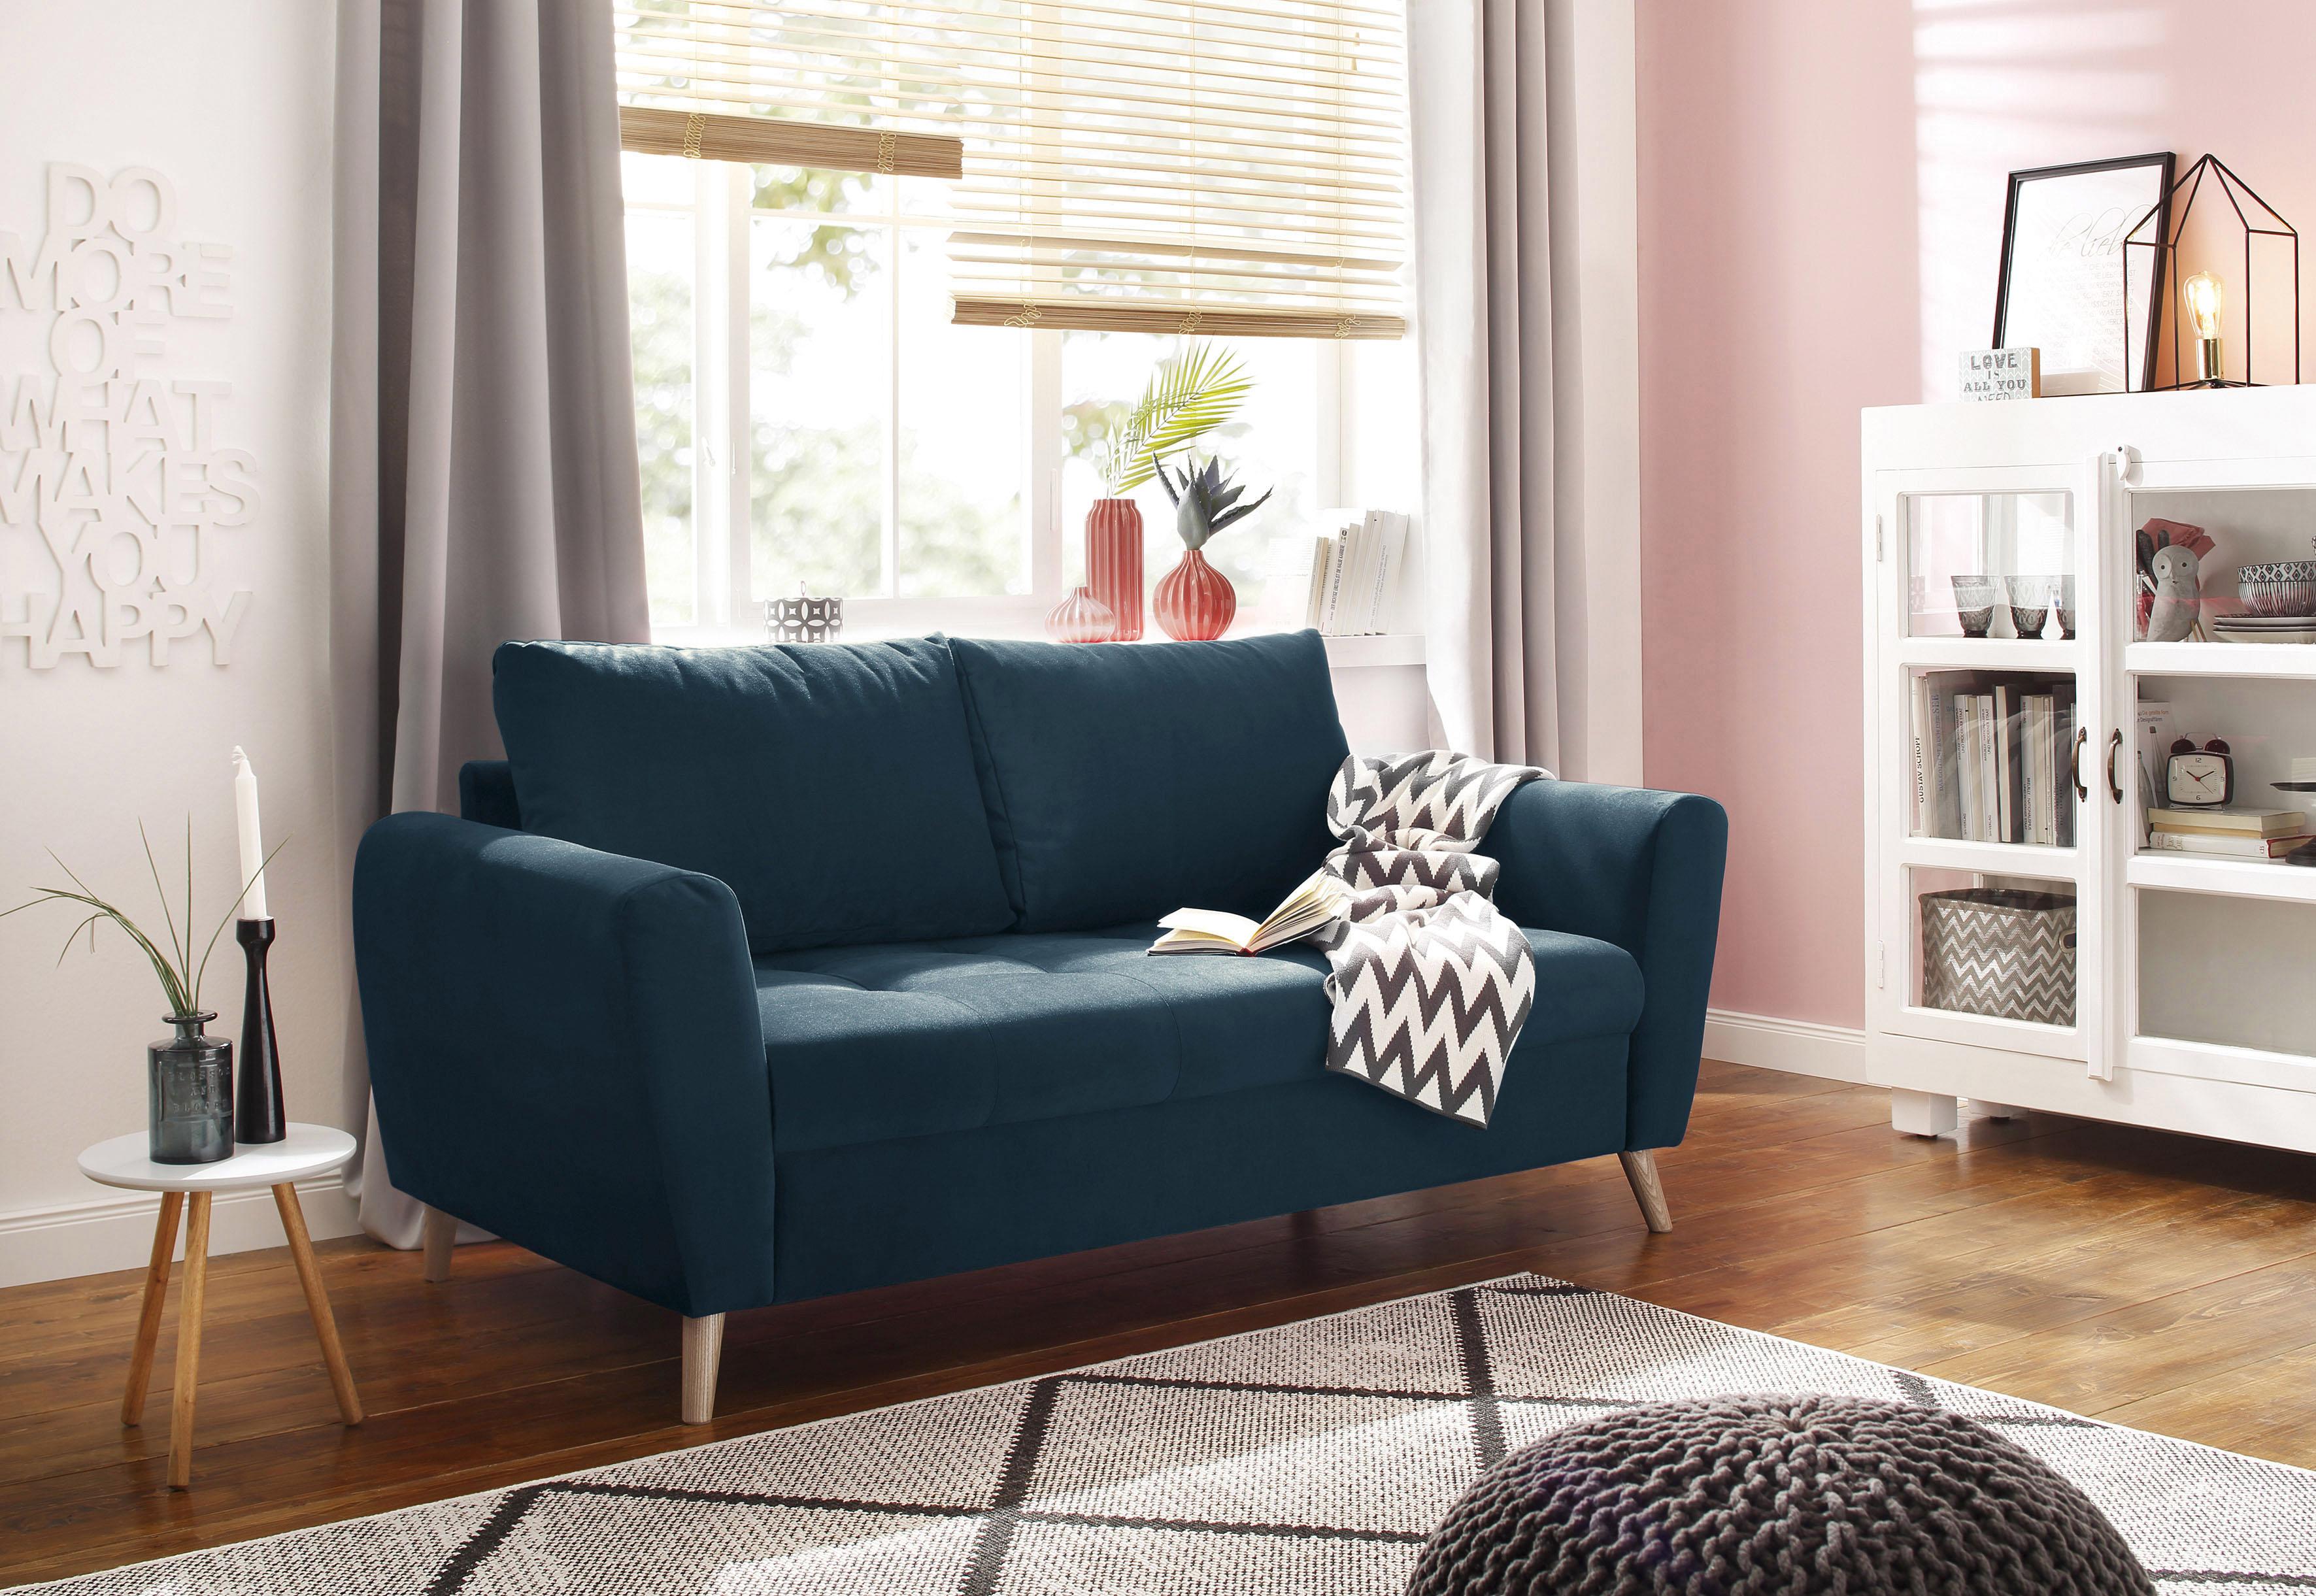 Home affaire 25-Sitzer Penelope Luxus